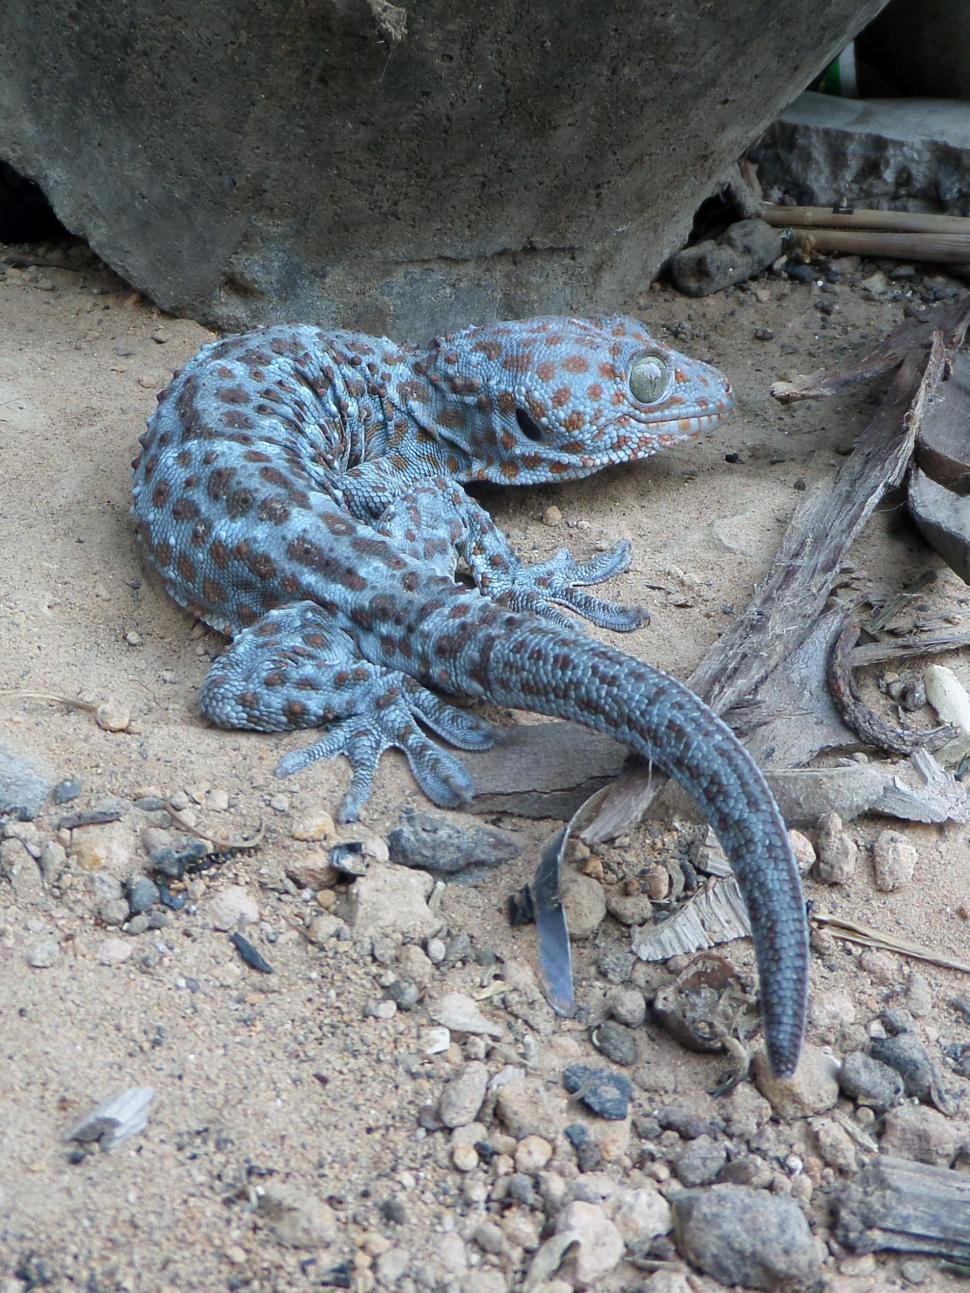 Download Free Stock Photo of Tokay gecko